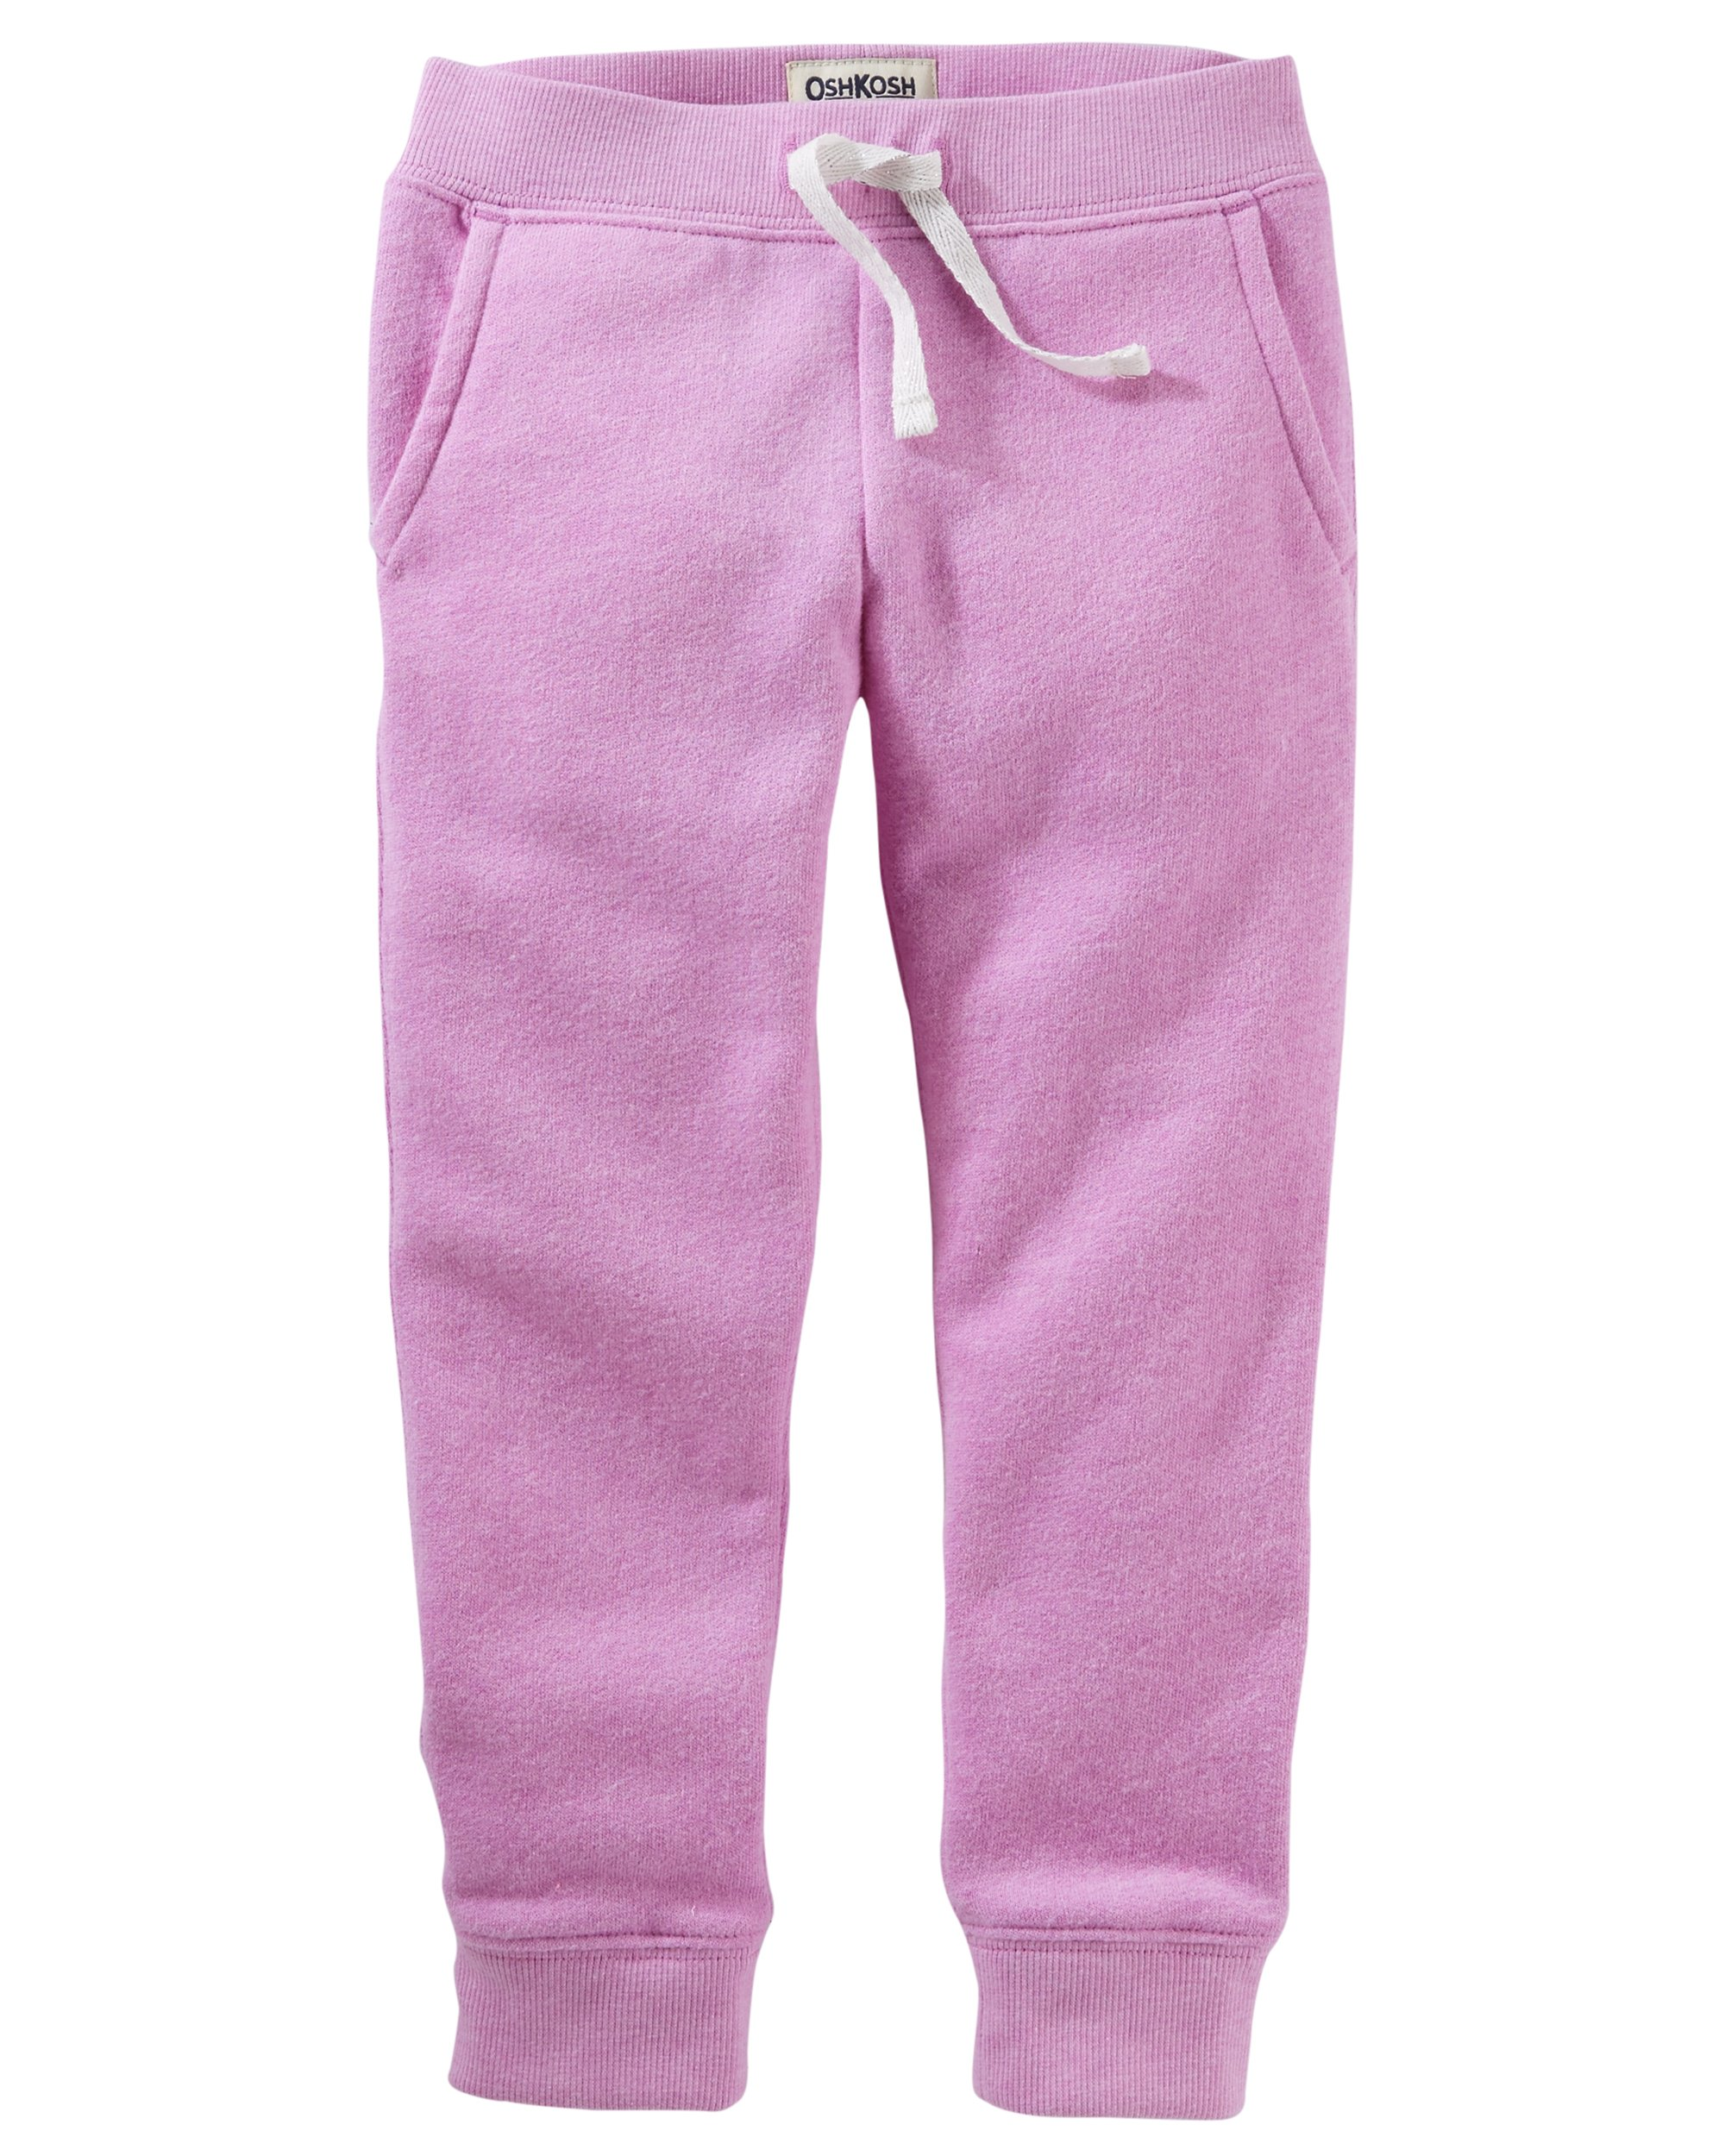 Osh Kosh Girls' Toddler Fleece Jogger Pants, Purple, 3T